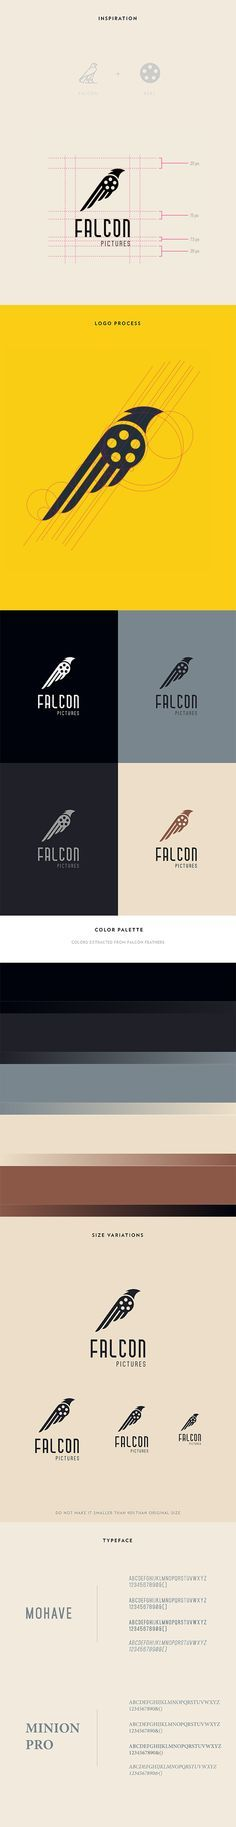 Falcon Pictures Logo Design by Grunz Saint / animal